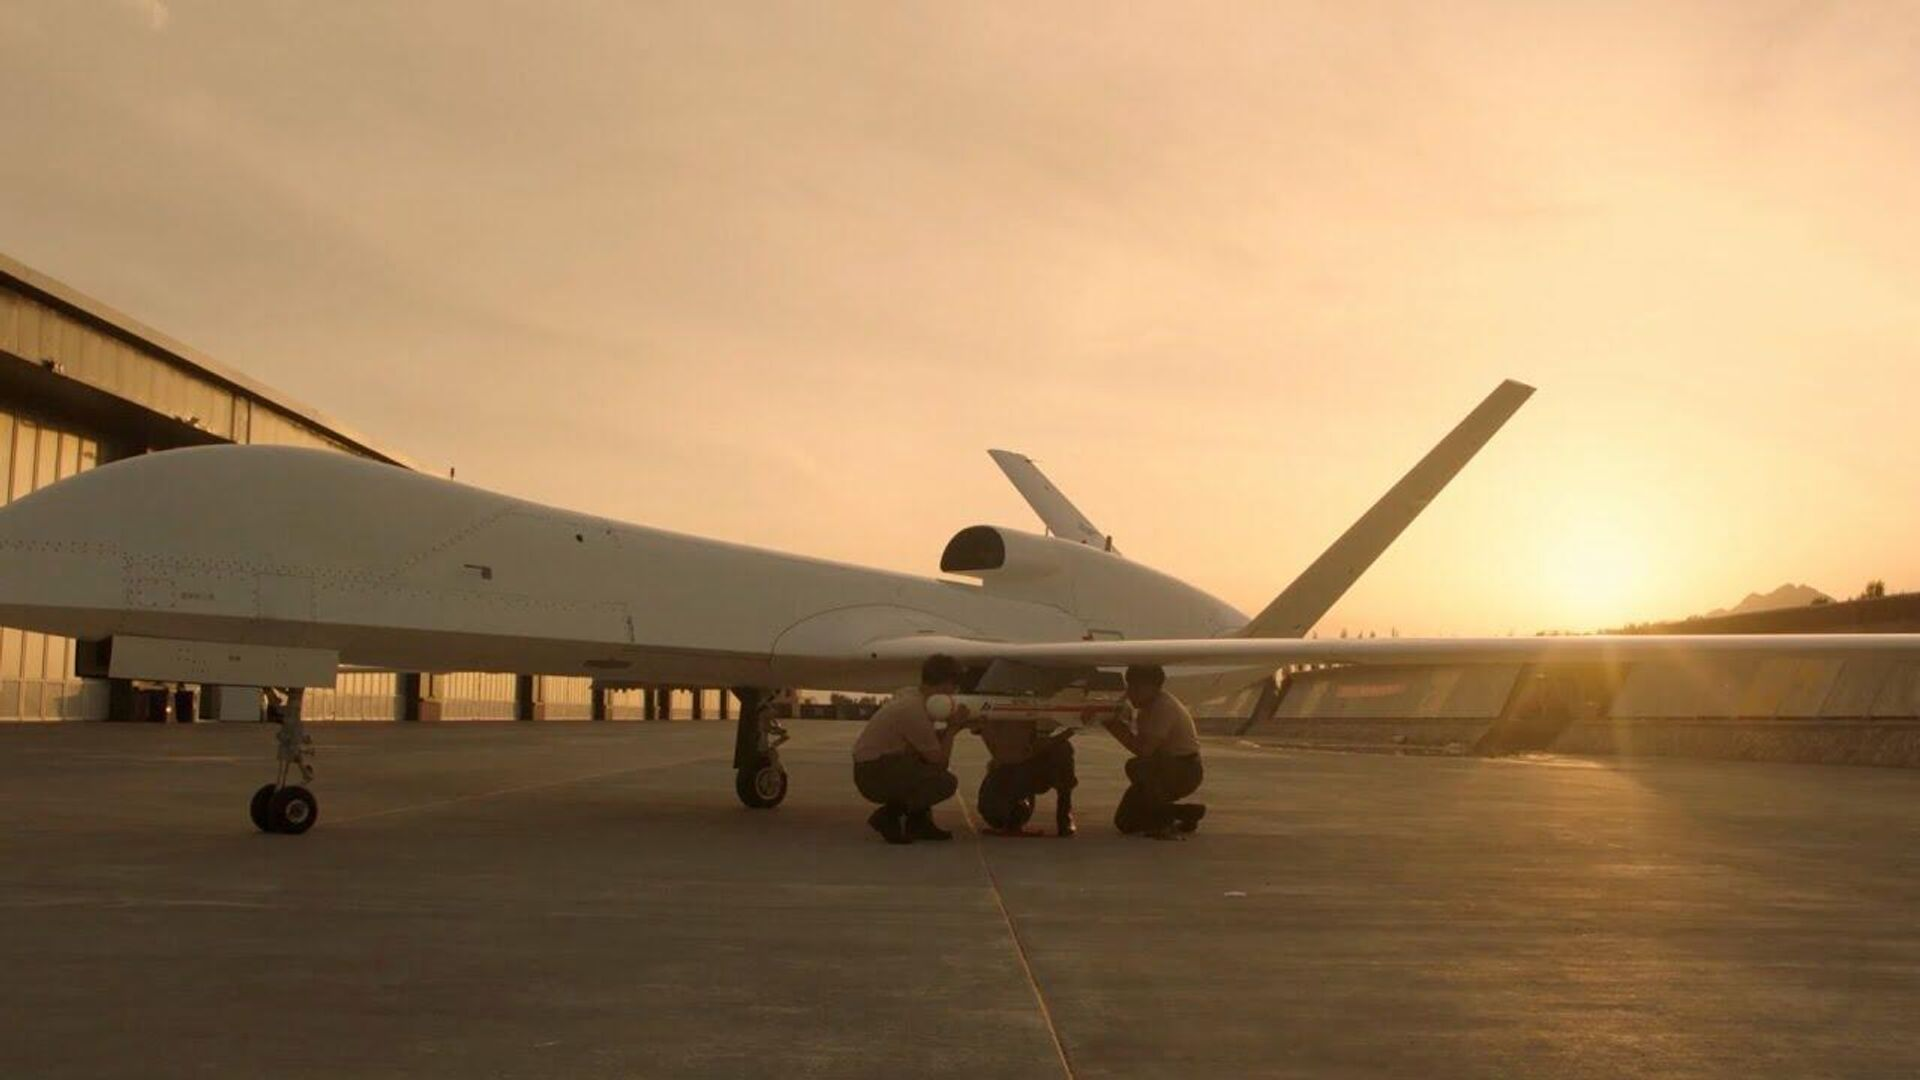 China's long-range WJ-700 UAV showcased at Airshow China 2021 - Sputnik International, 1920, 14.10.2021